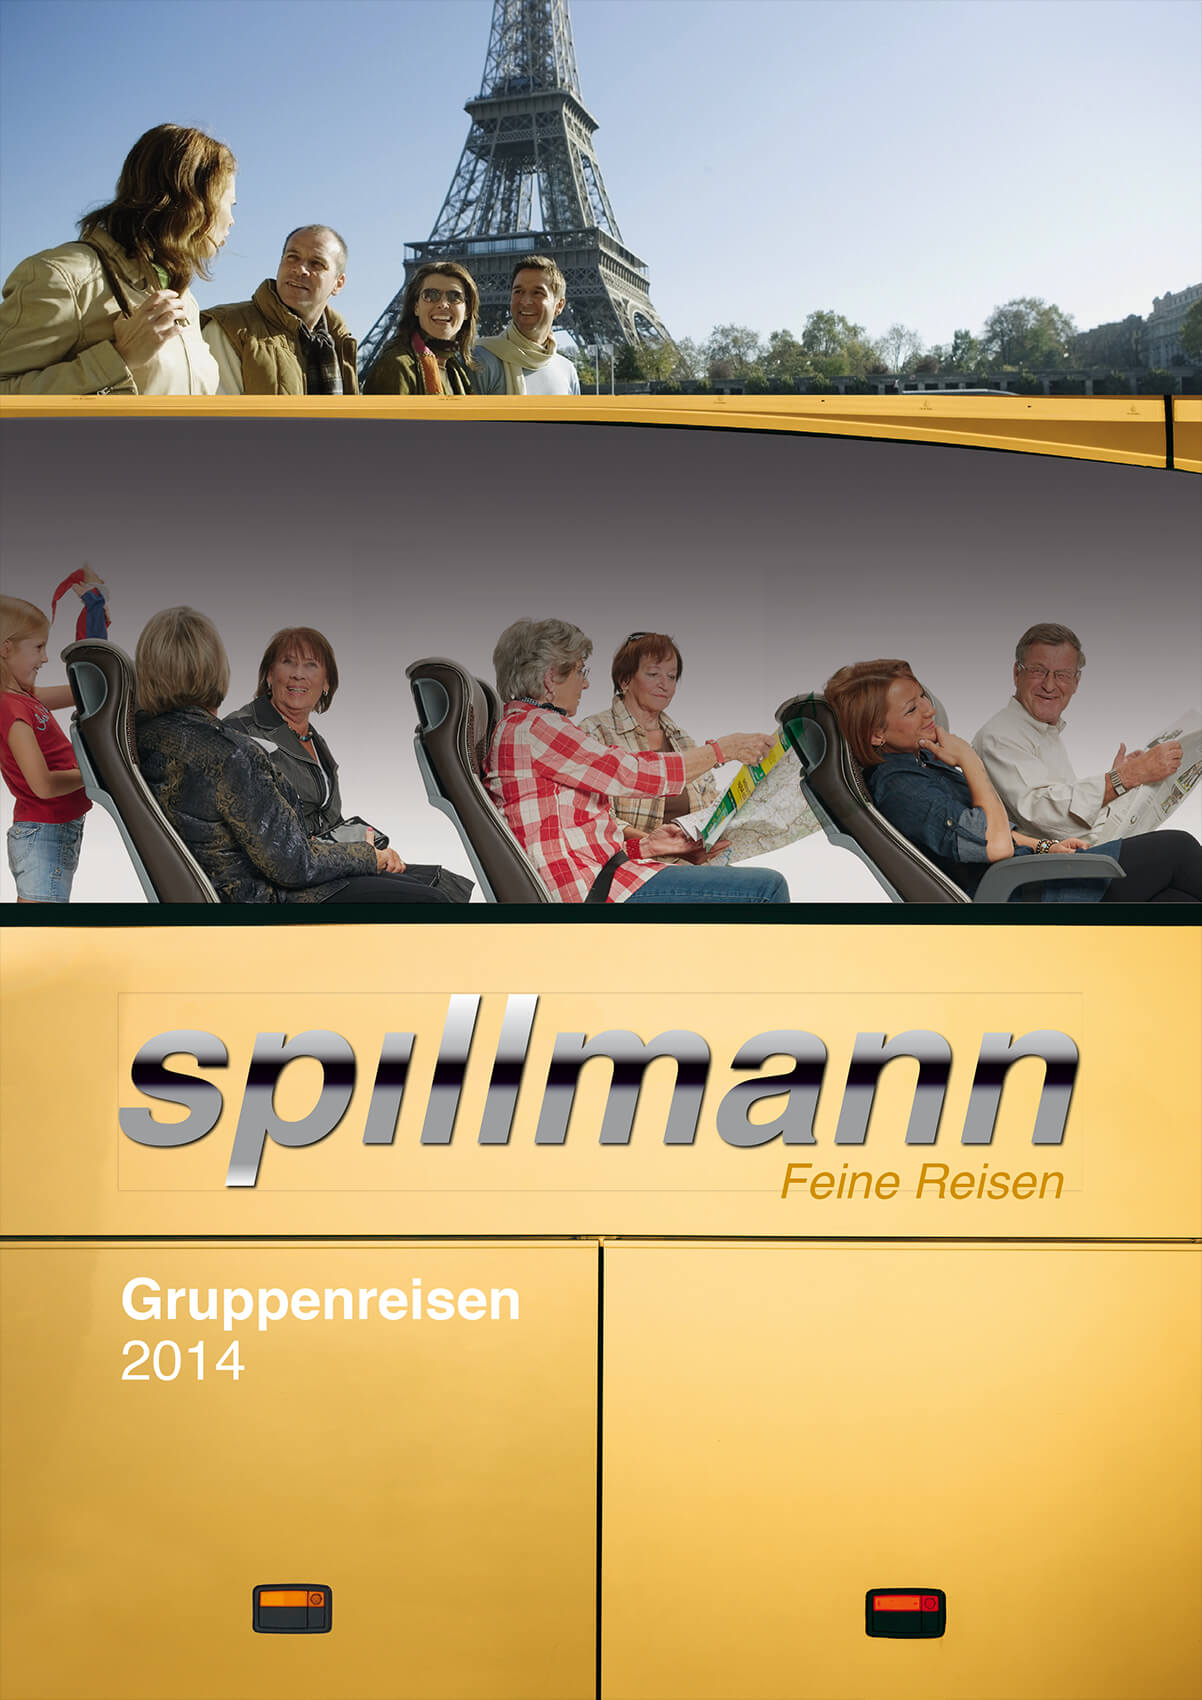 gruppen-reisekatalog-spillmann-agentur-intermar-corporate.jpg